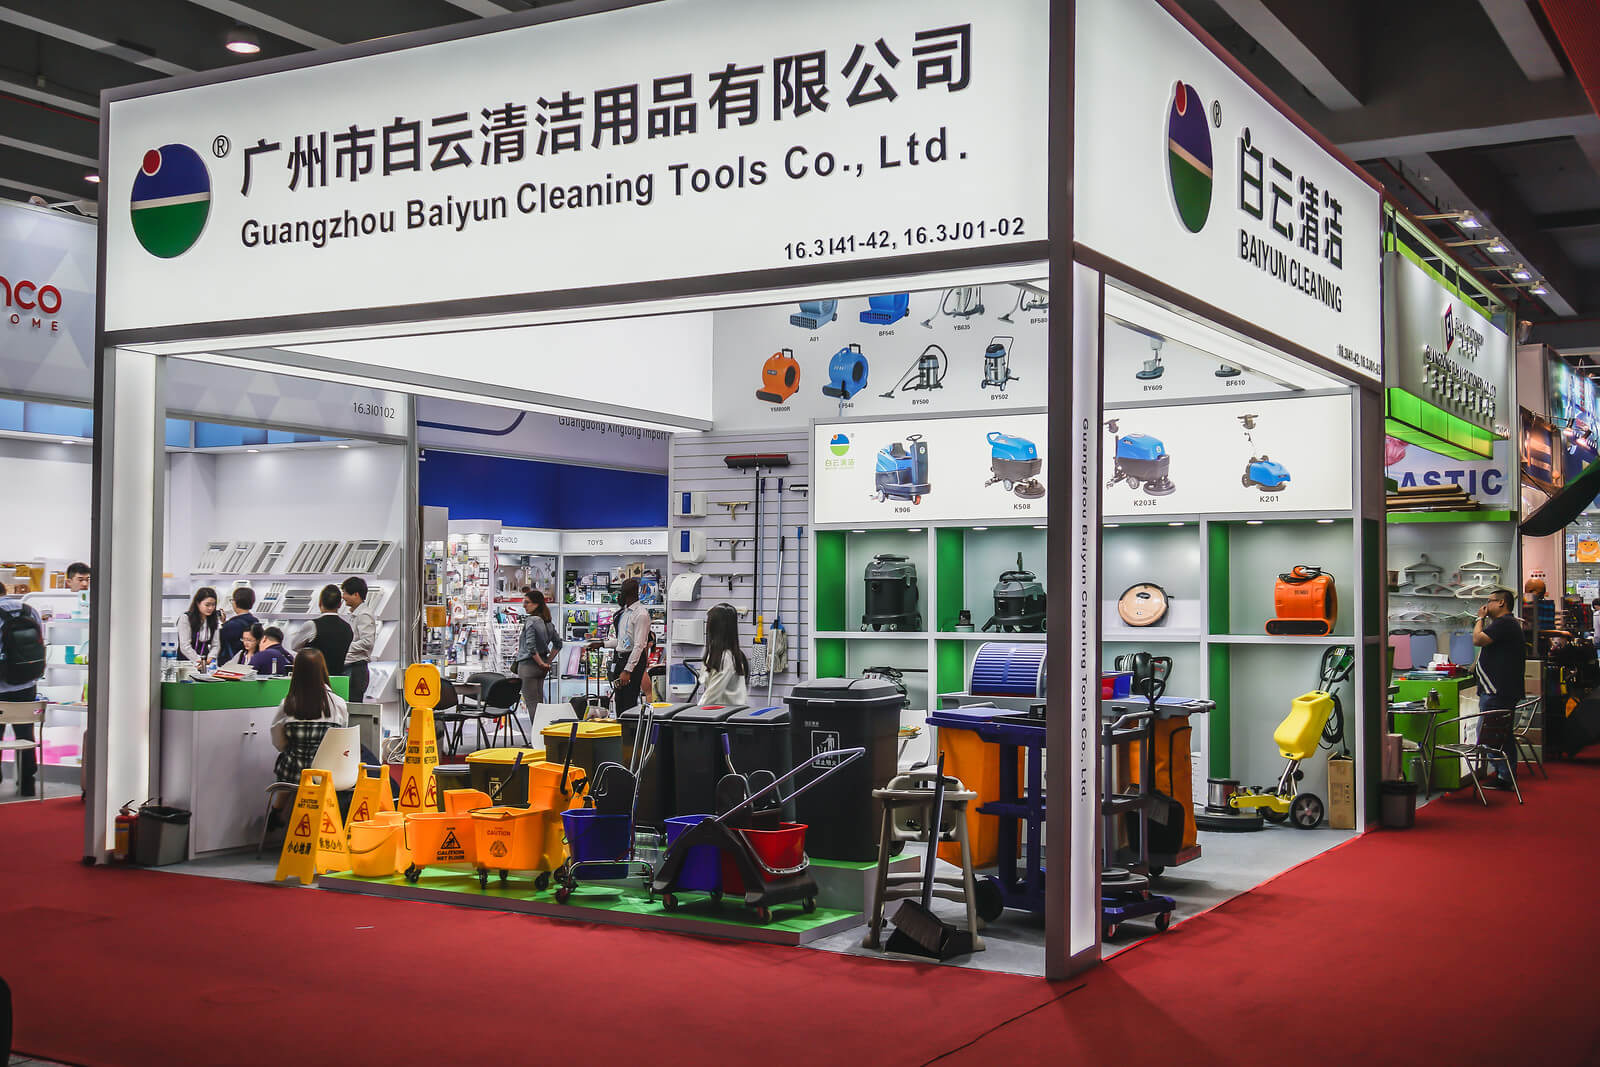 A Trading Company in China